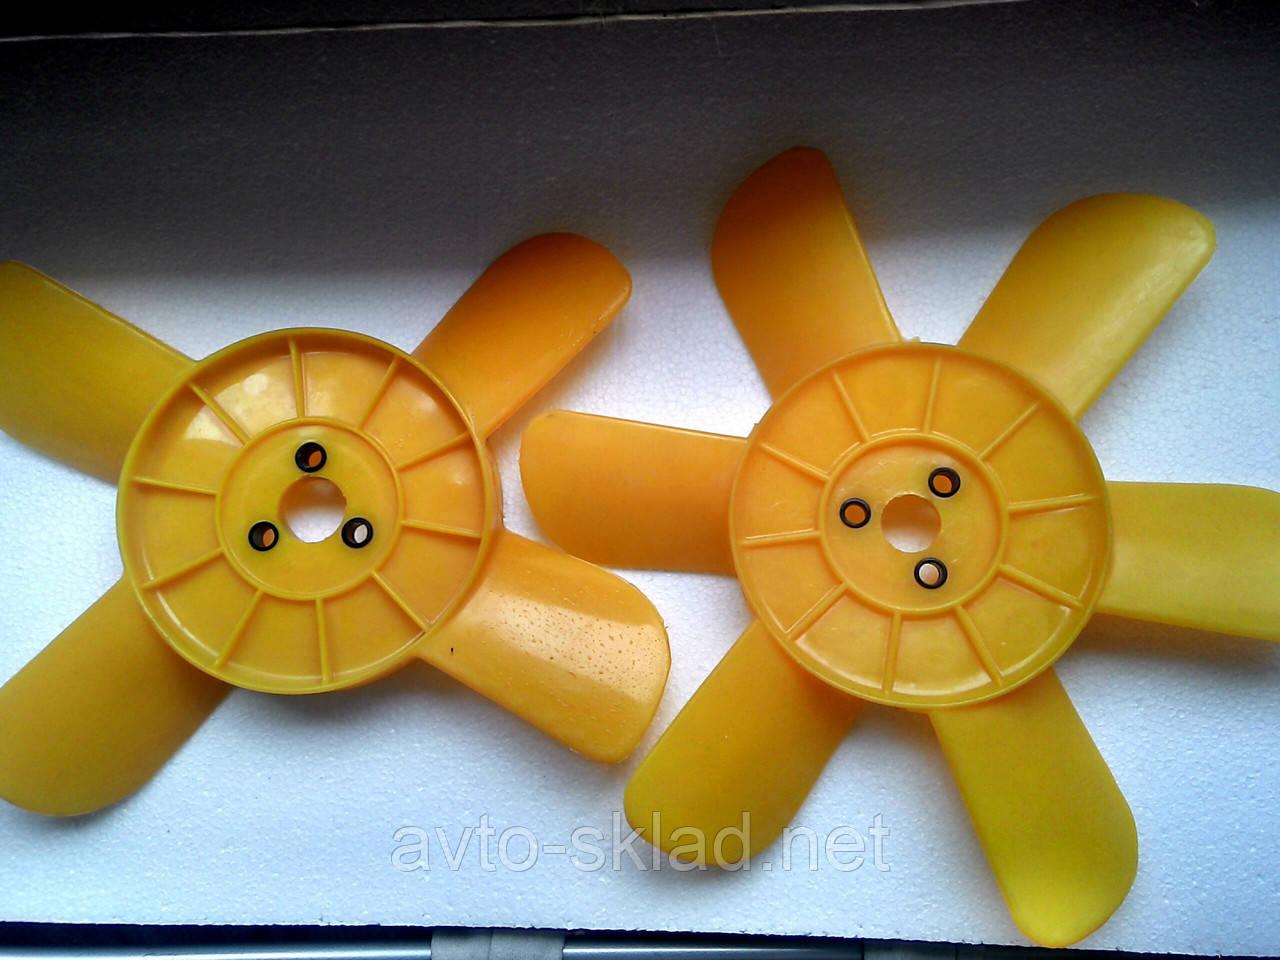 Вентилятор 2101, 2102, 2103, 2104, 2105, 2106, 2107, 2121 6, 4 лопастной Желтый